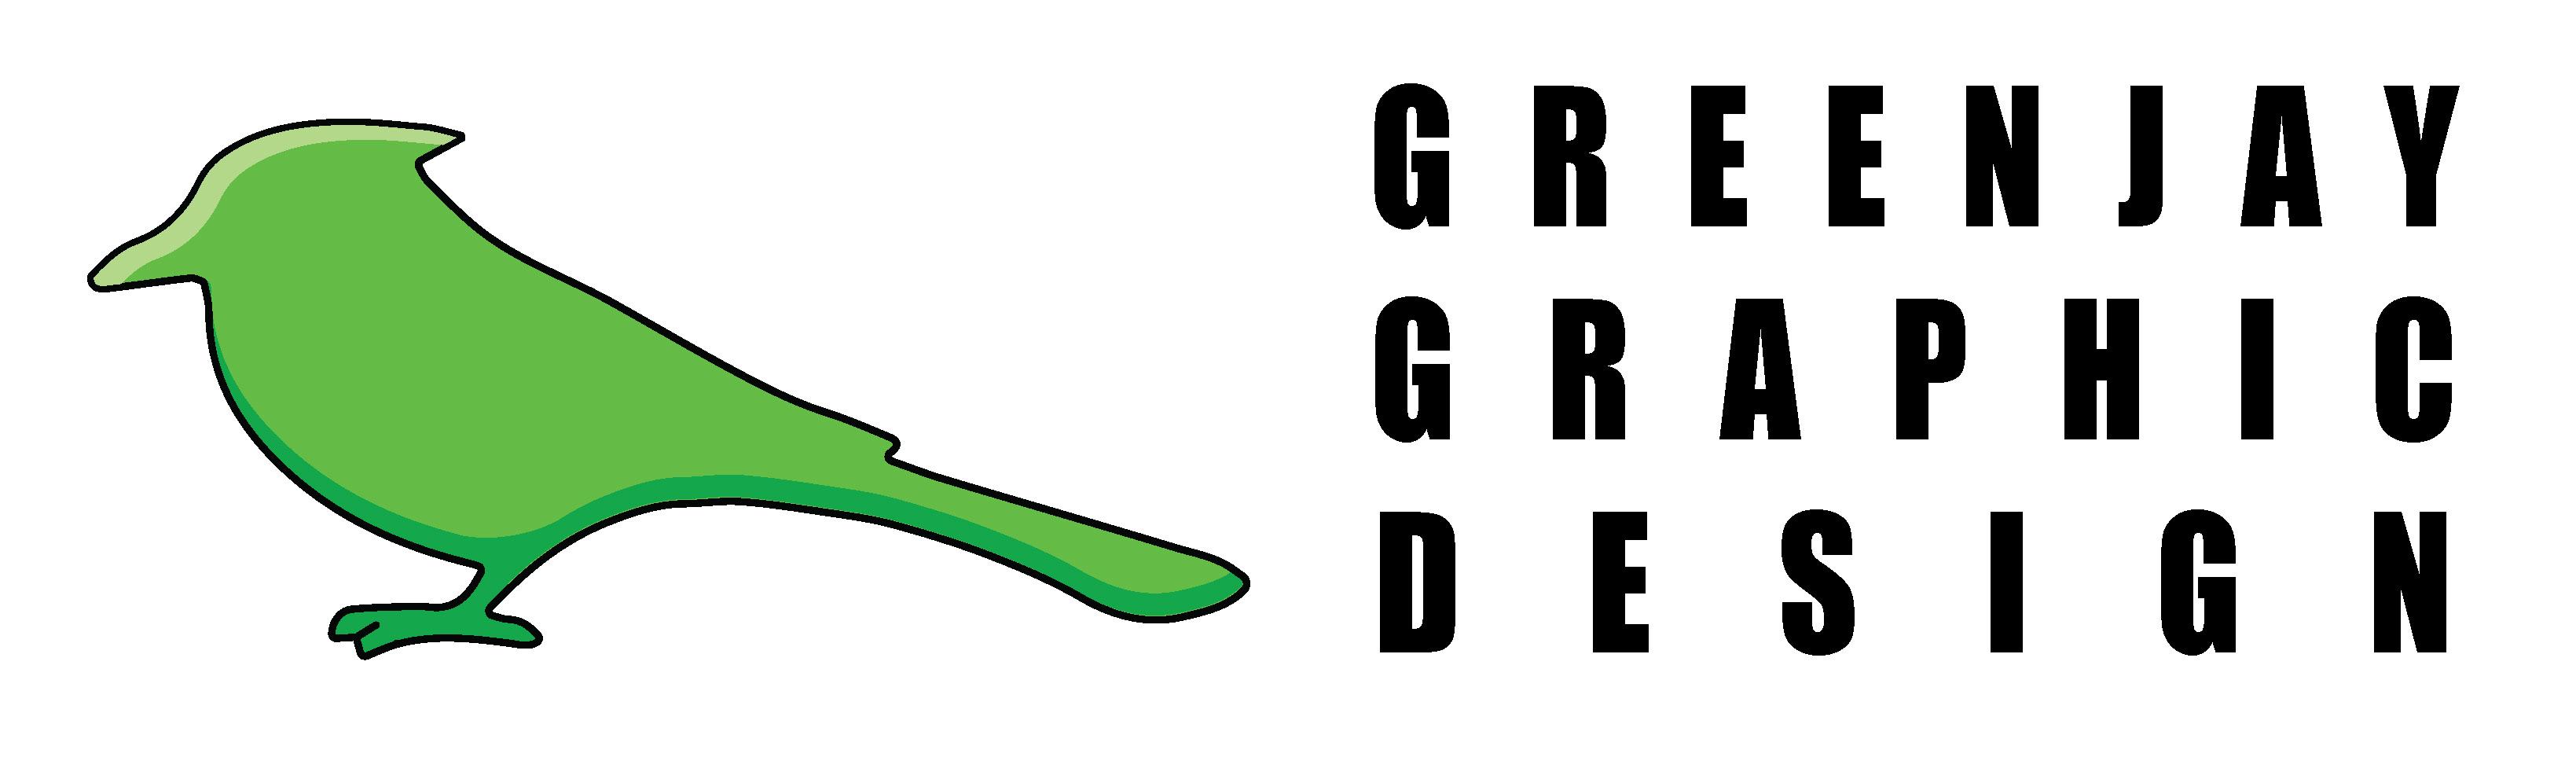 Green Jay Graphic Design